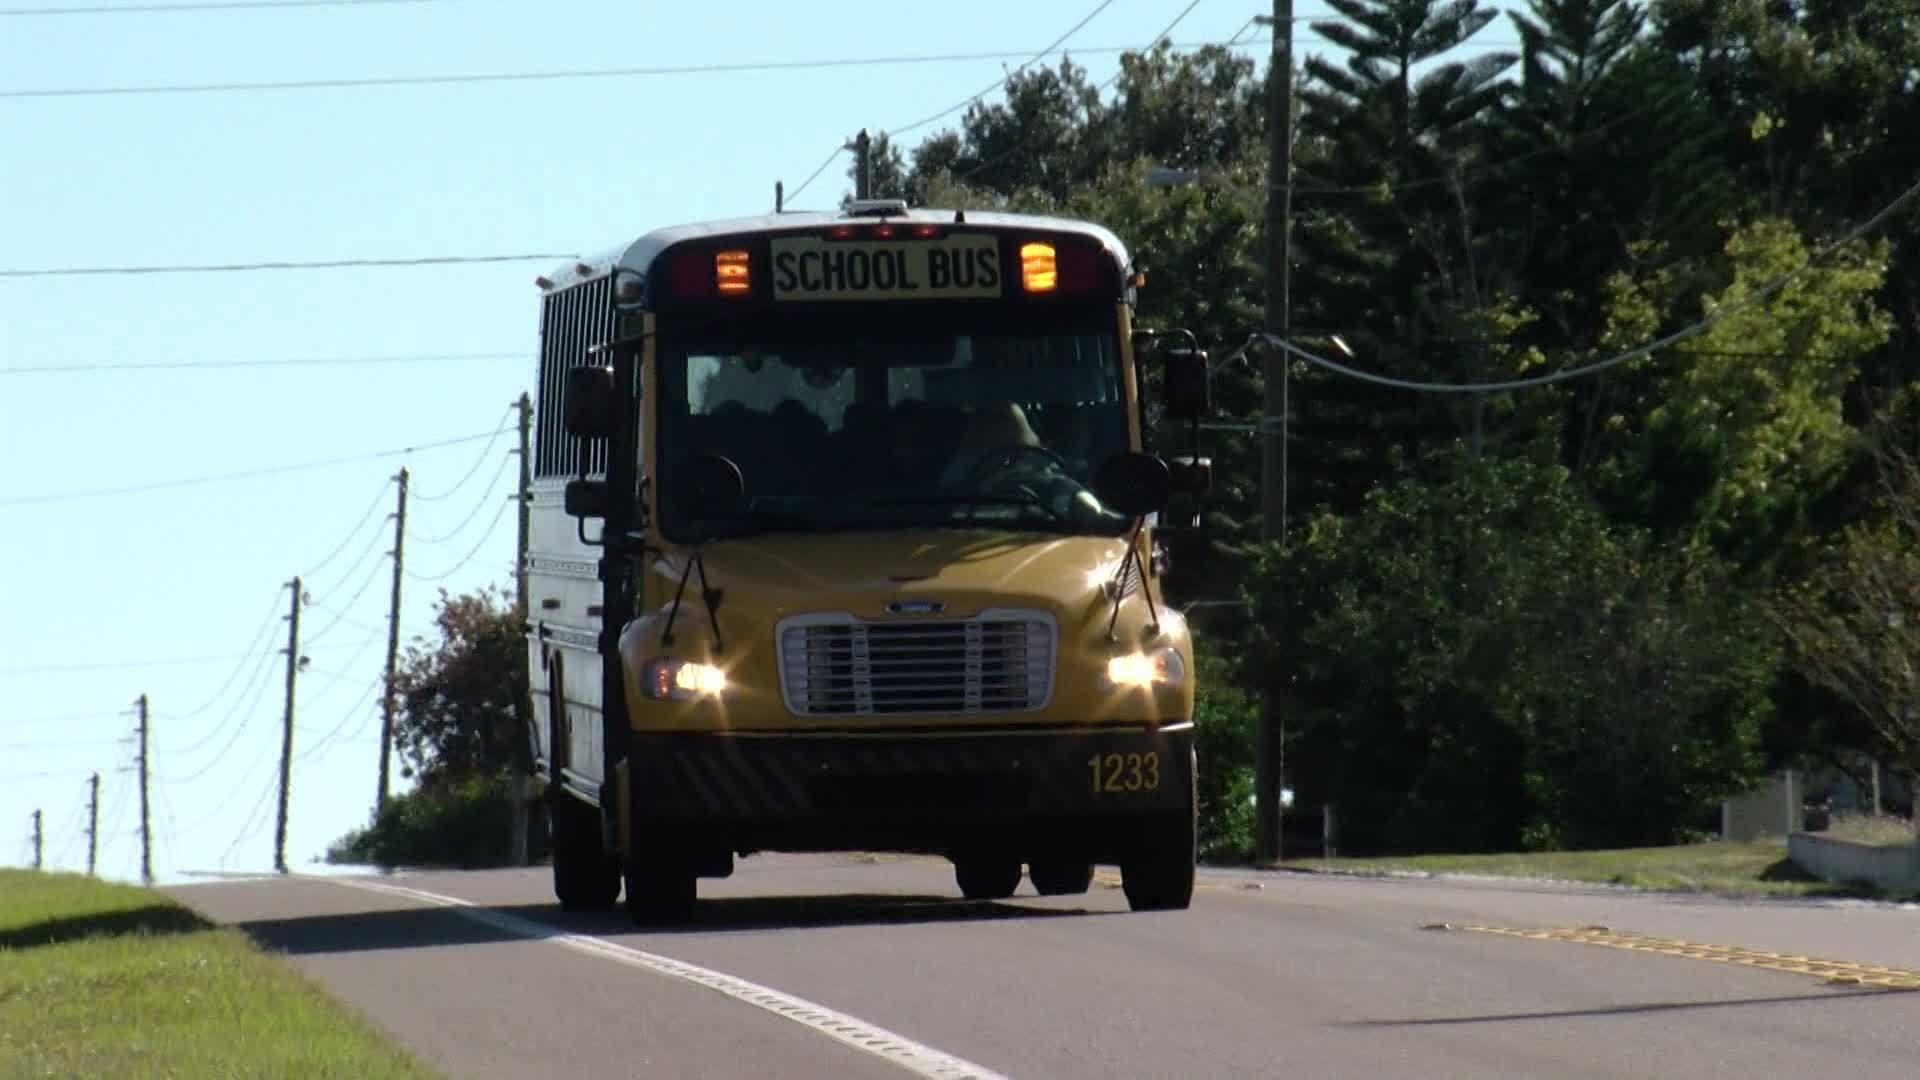 Polk_County_school_bus_driver_pleading_w_7_20181205224529